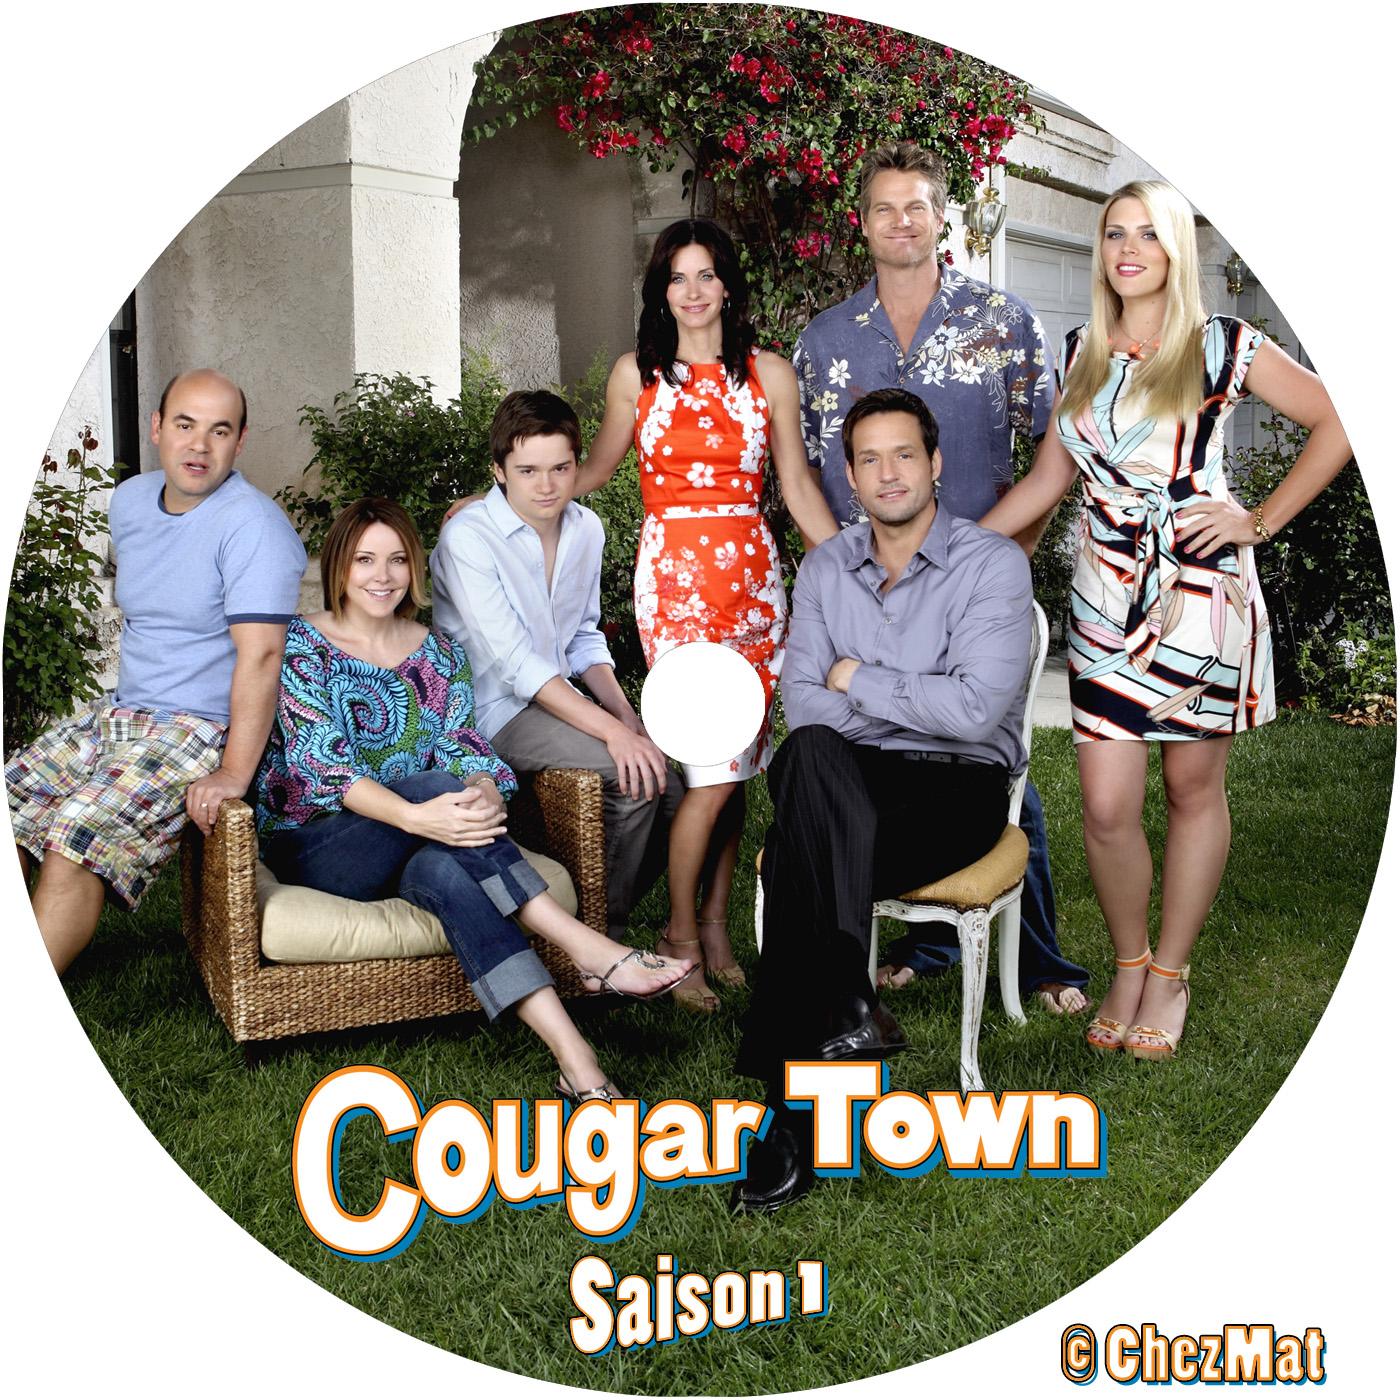 cougar town saison 1 geekroniques. Black Bedroom Furniture Sets. Home Design Ideas